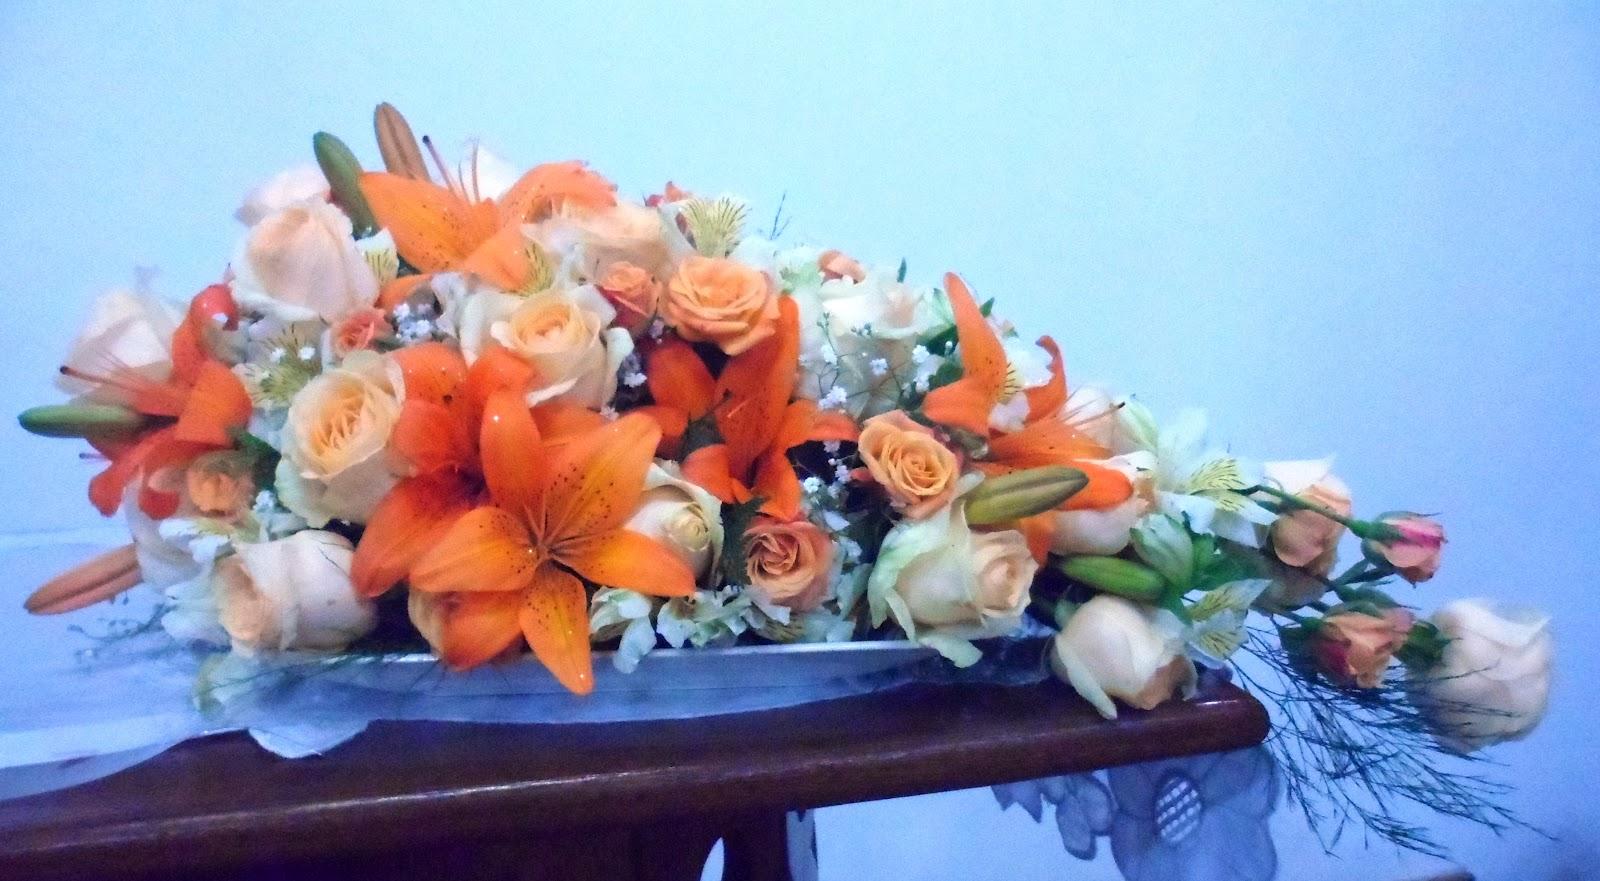 flores jardim camburi : flores jardim camburi:Divina Flor!: Arranjo para vigília Jardim Camburi 2